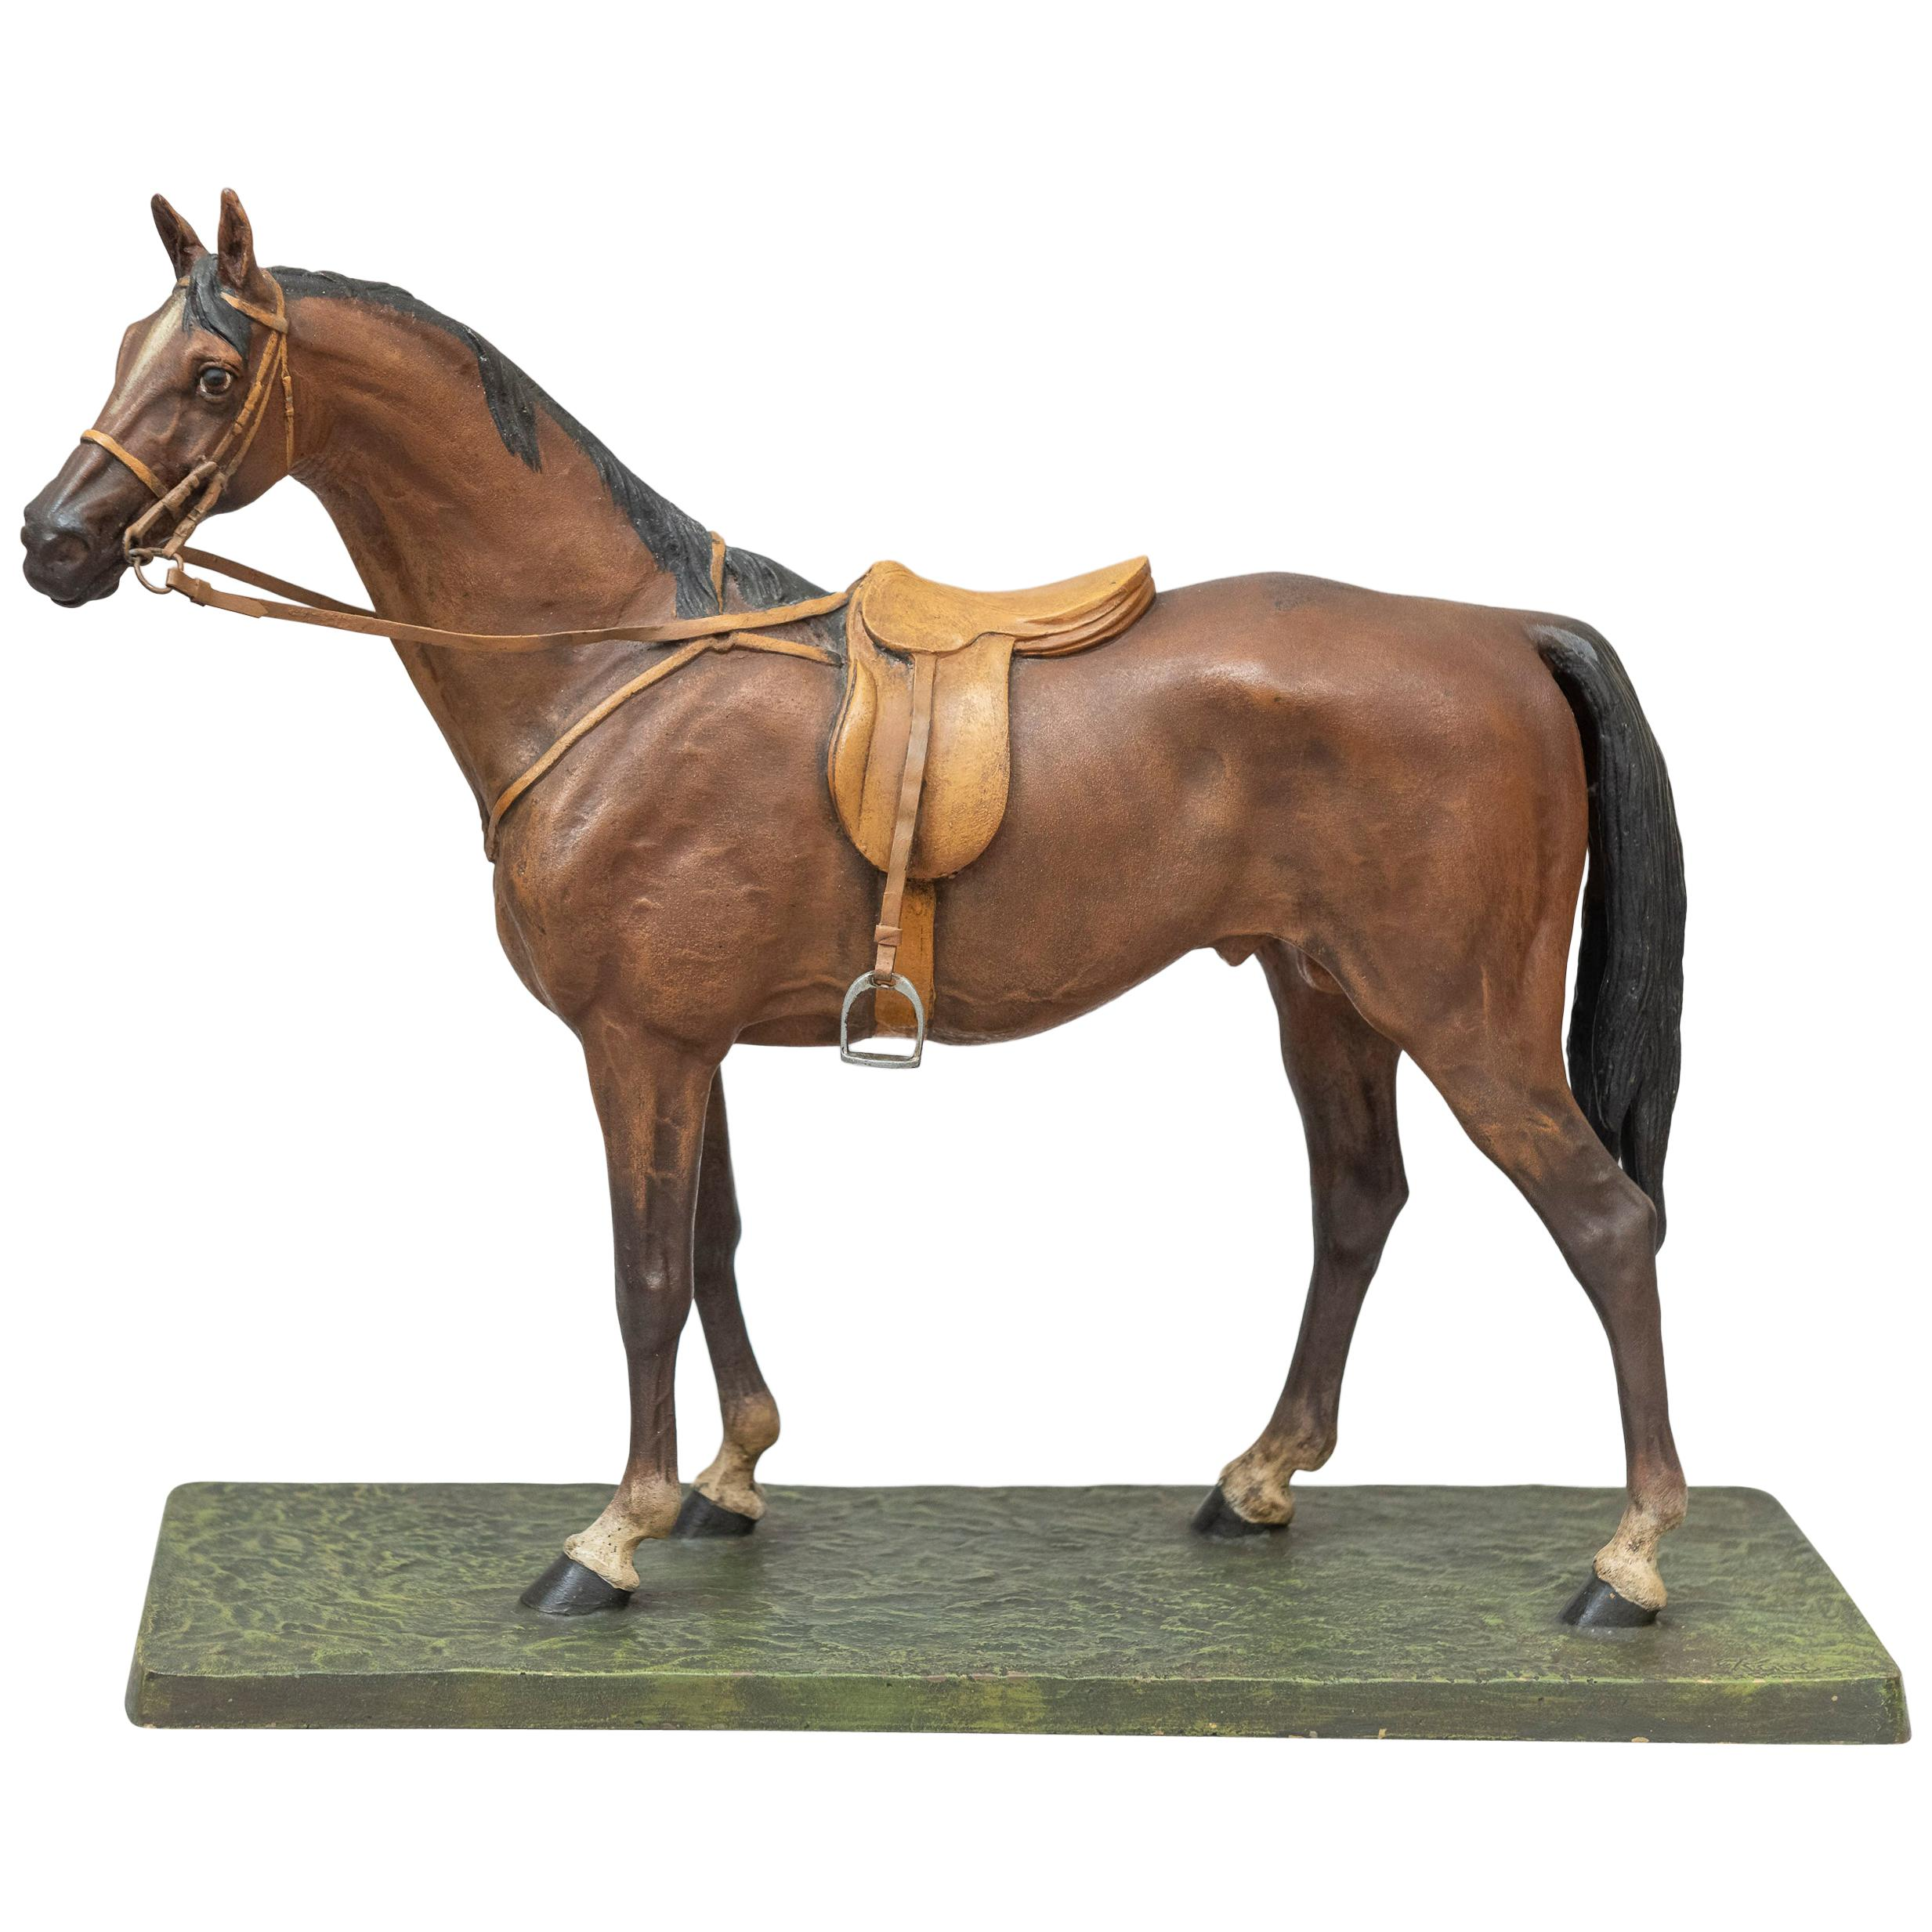 Vienna Bronze Cold Painted Horse, Signed Kauba, circa 1900